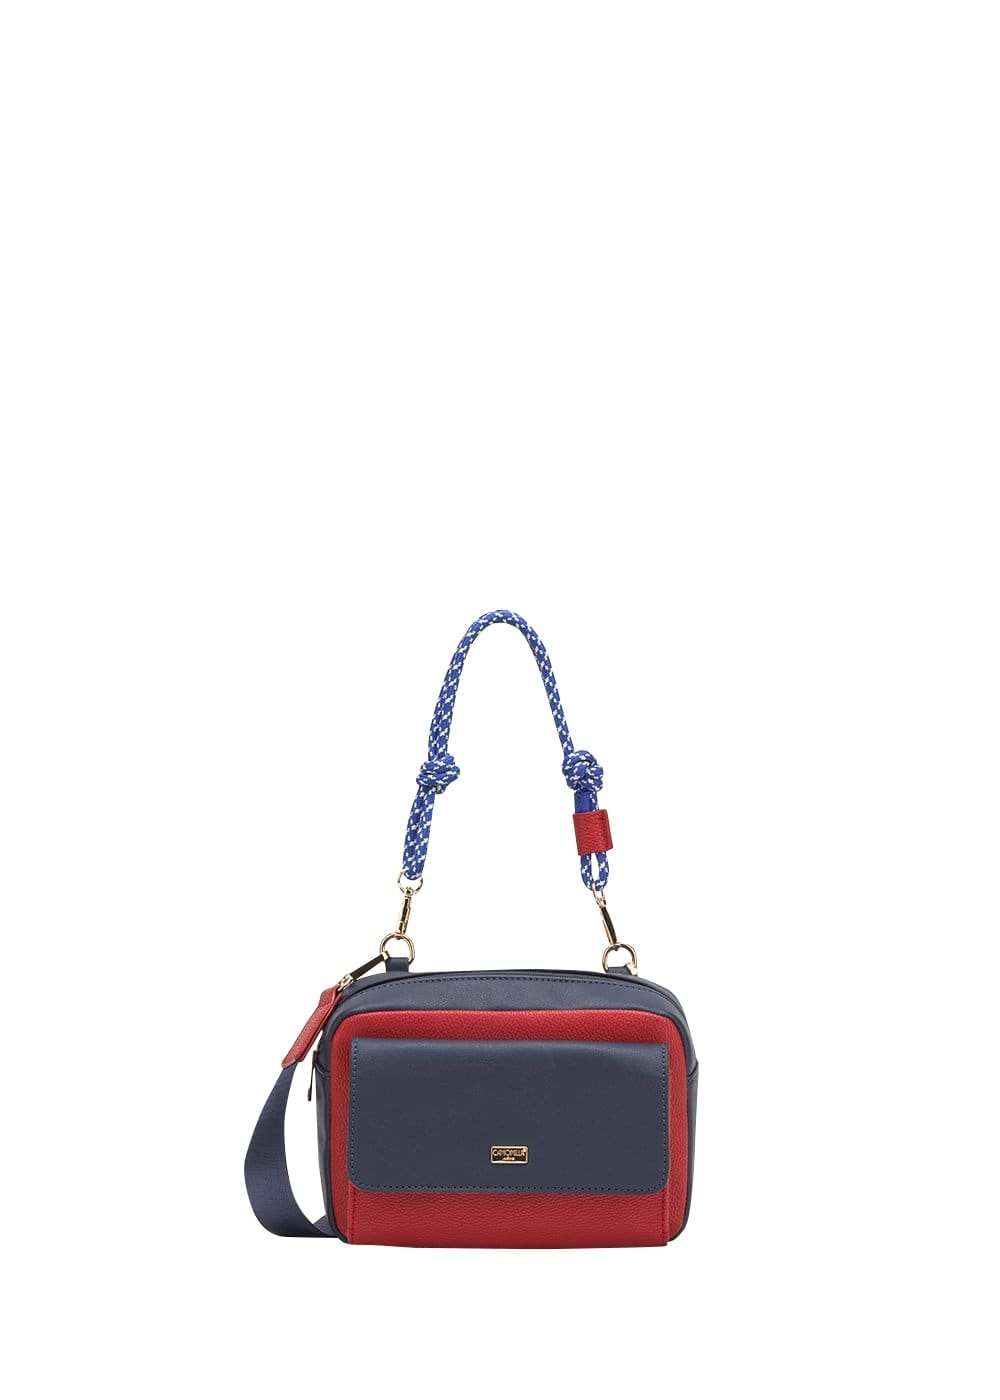 Biwi bag with rope handle